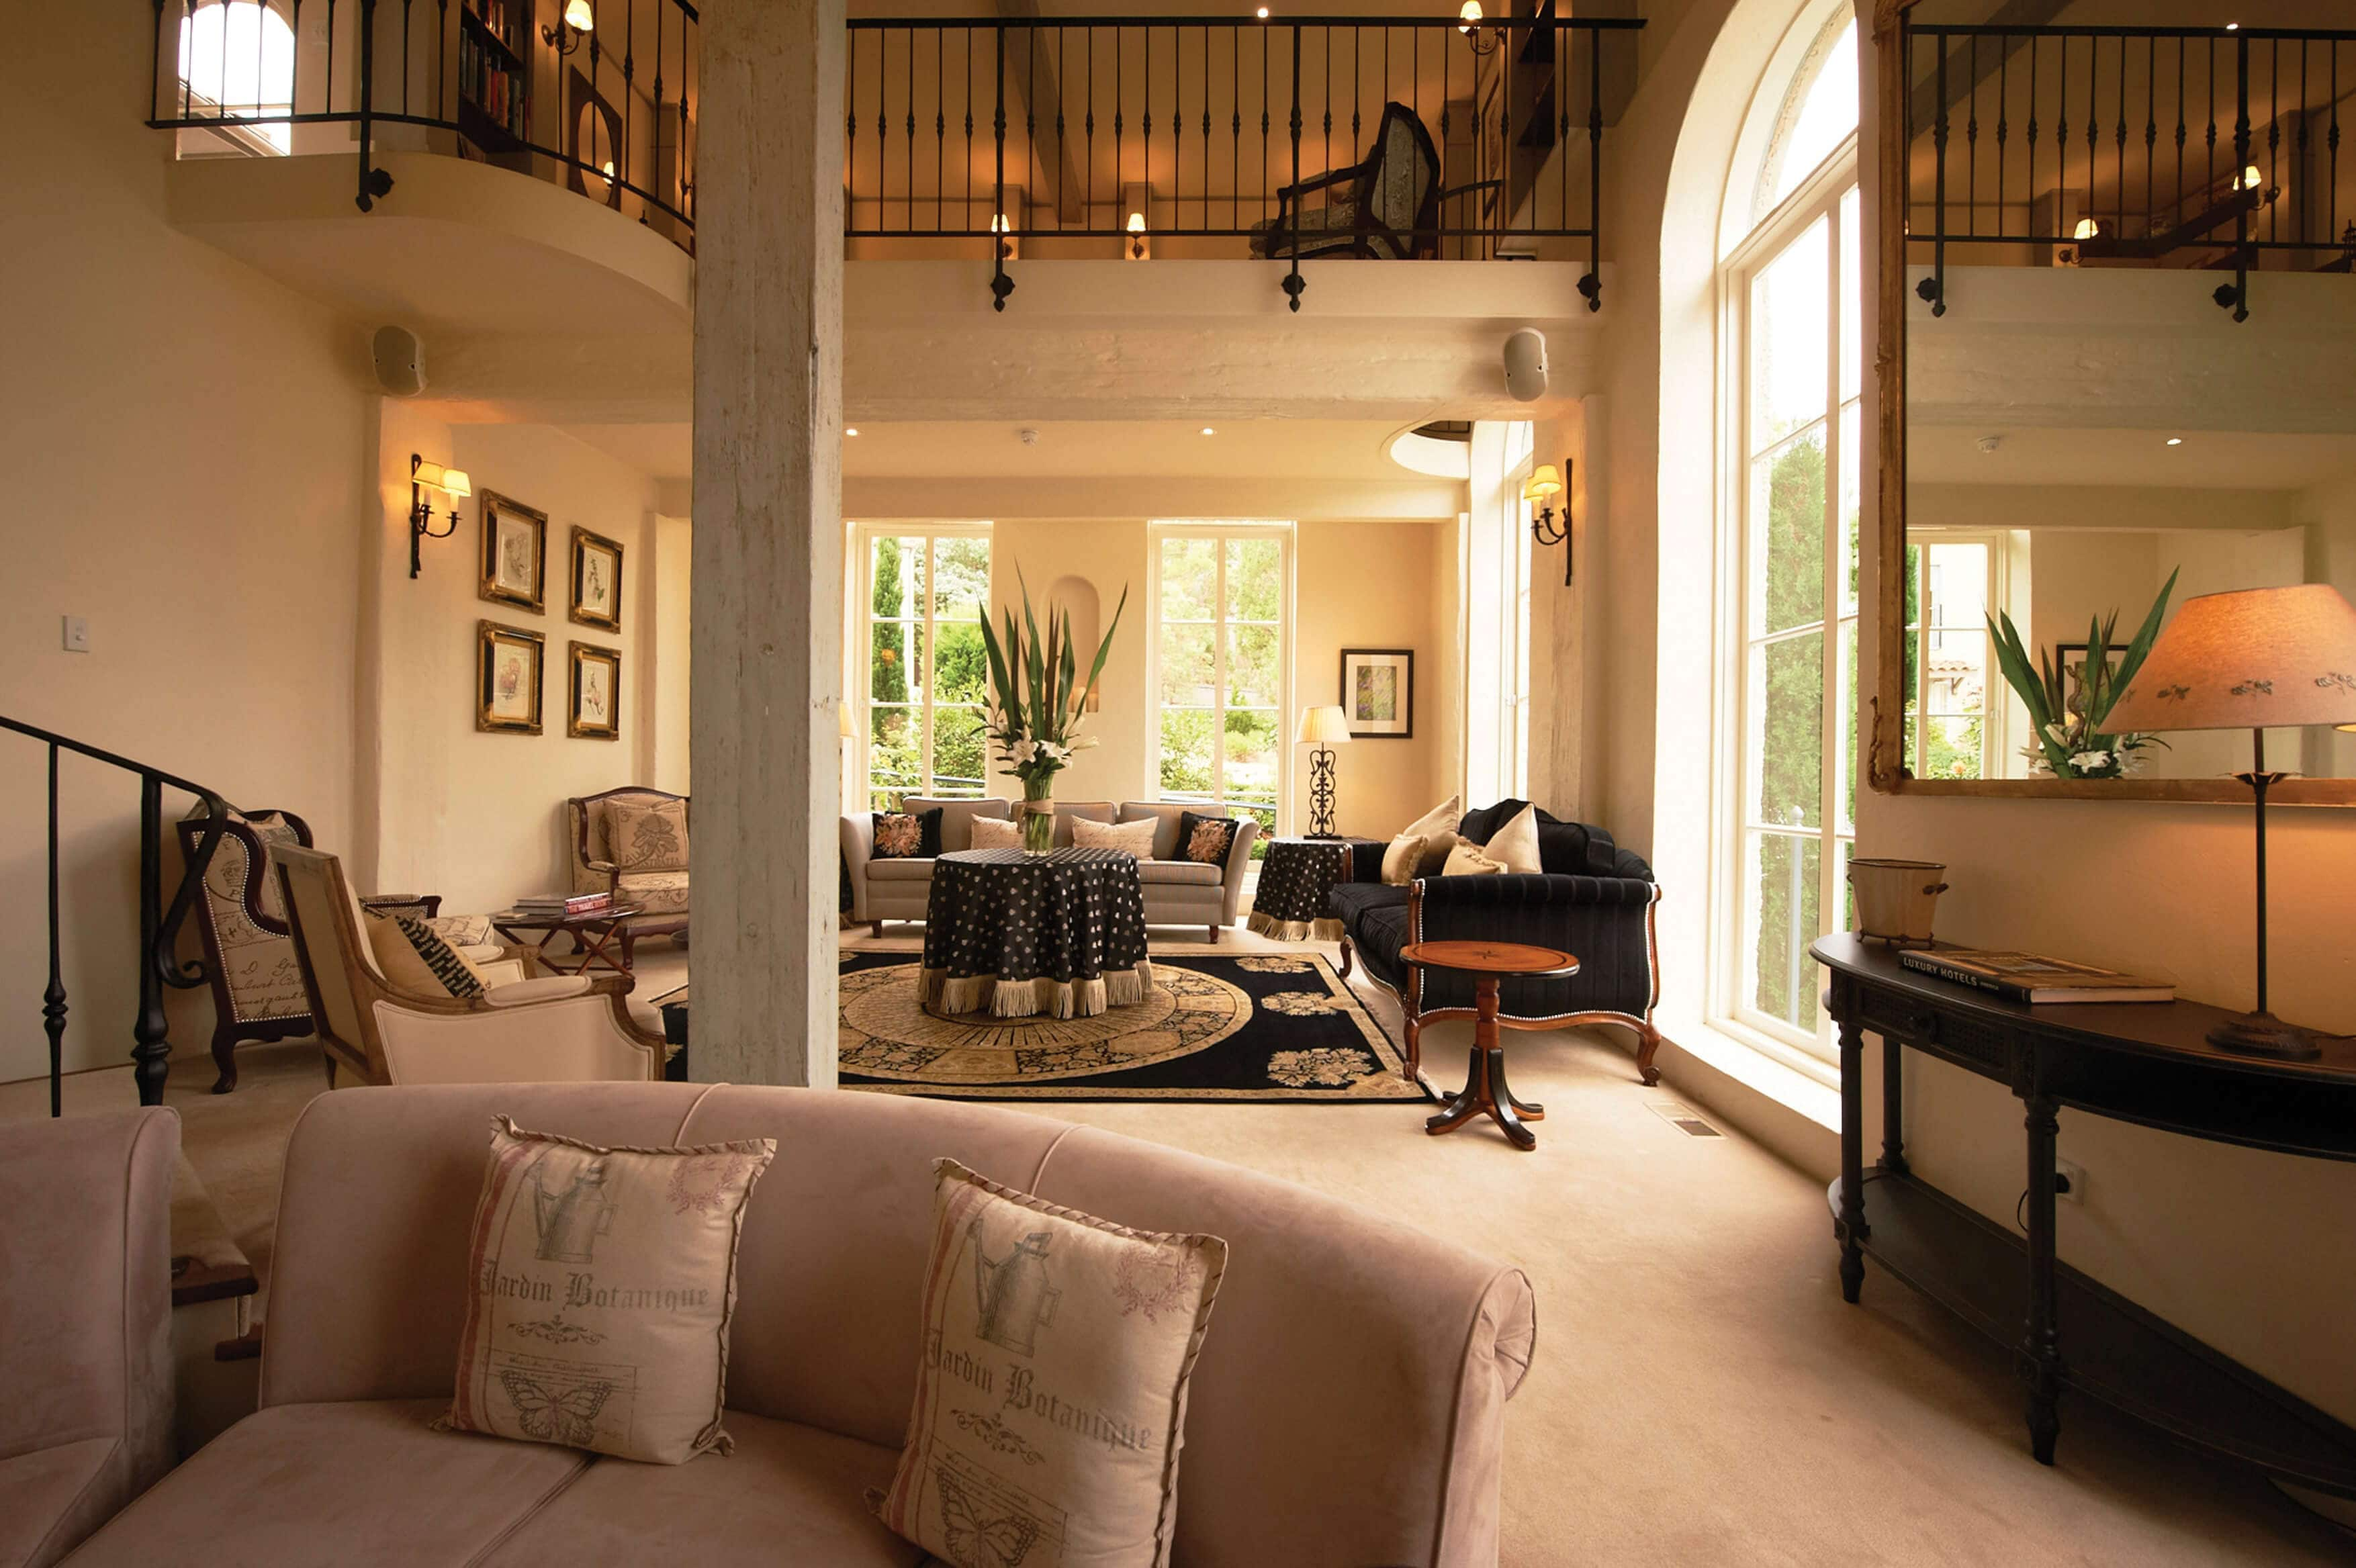 al fresco dining in tasmania spirit of tasmania blog. Black Bedroom Furniture Sets. Home Design Ideas